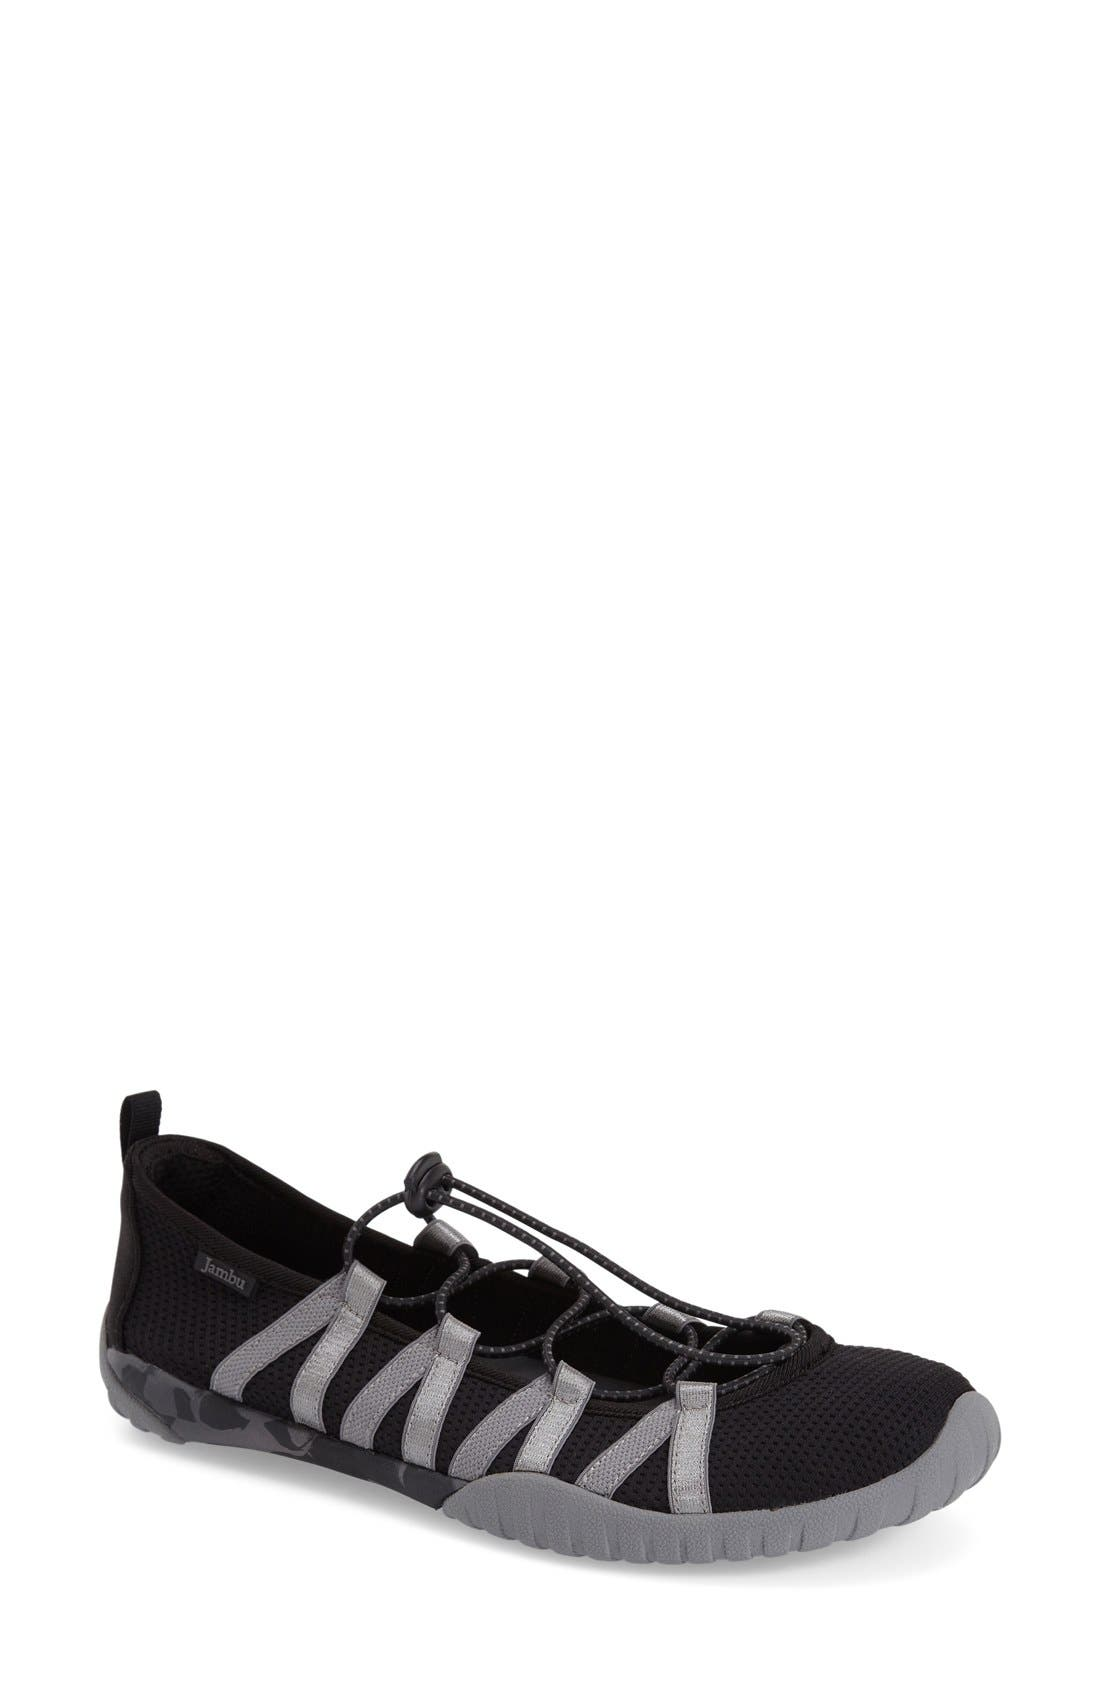 'Manuka' Water Friendly Slip-On Sneaker,                         Main,                         color, Black Fabric